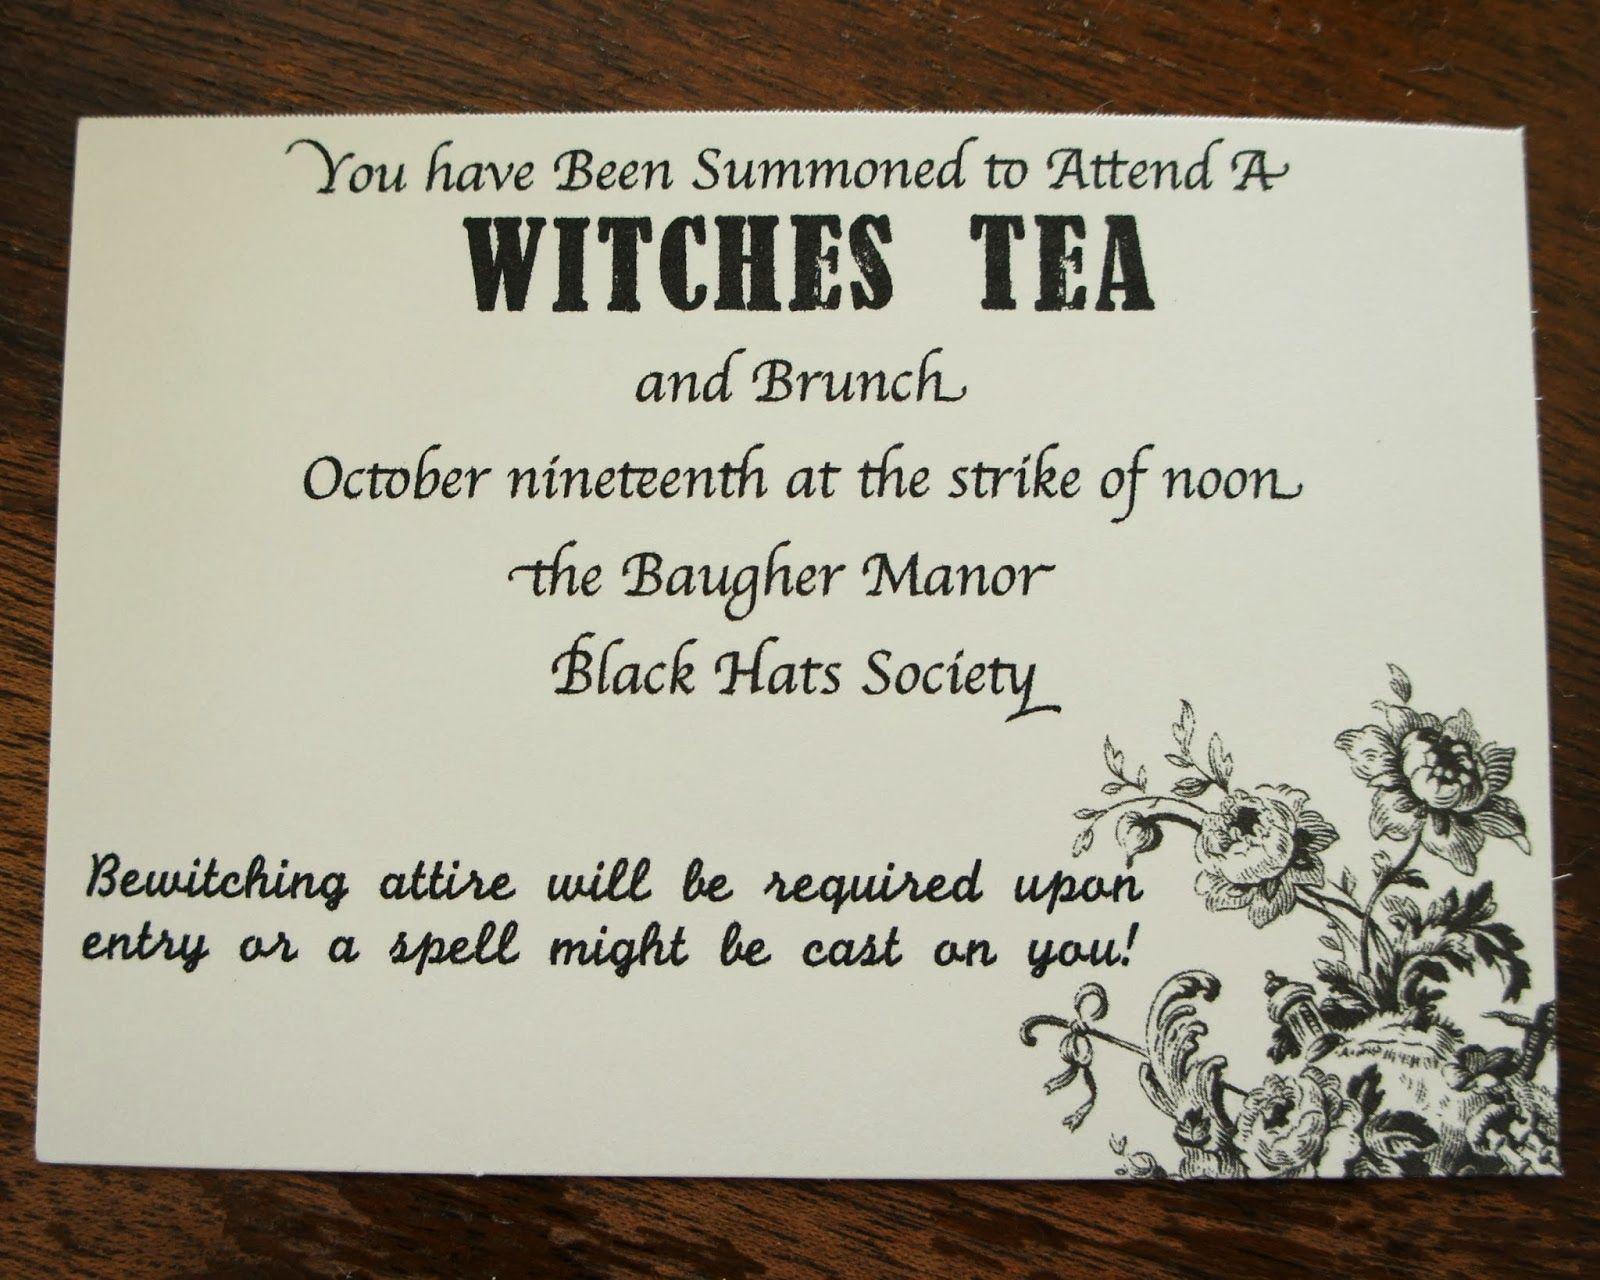 Witches tea party decor and invitation inspiration | Invitation ...